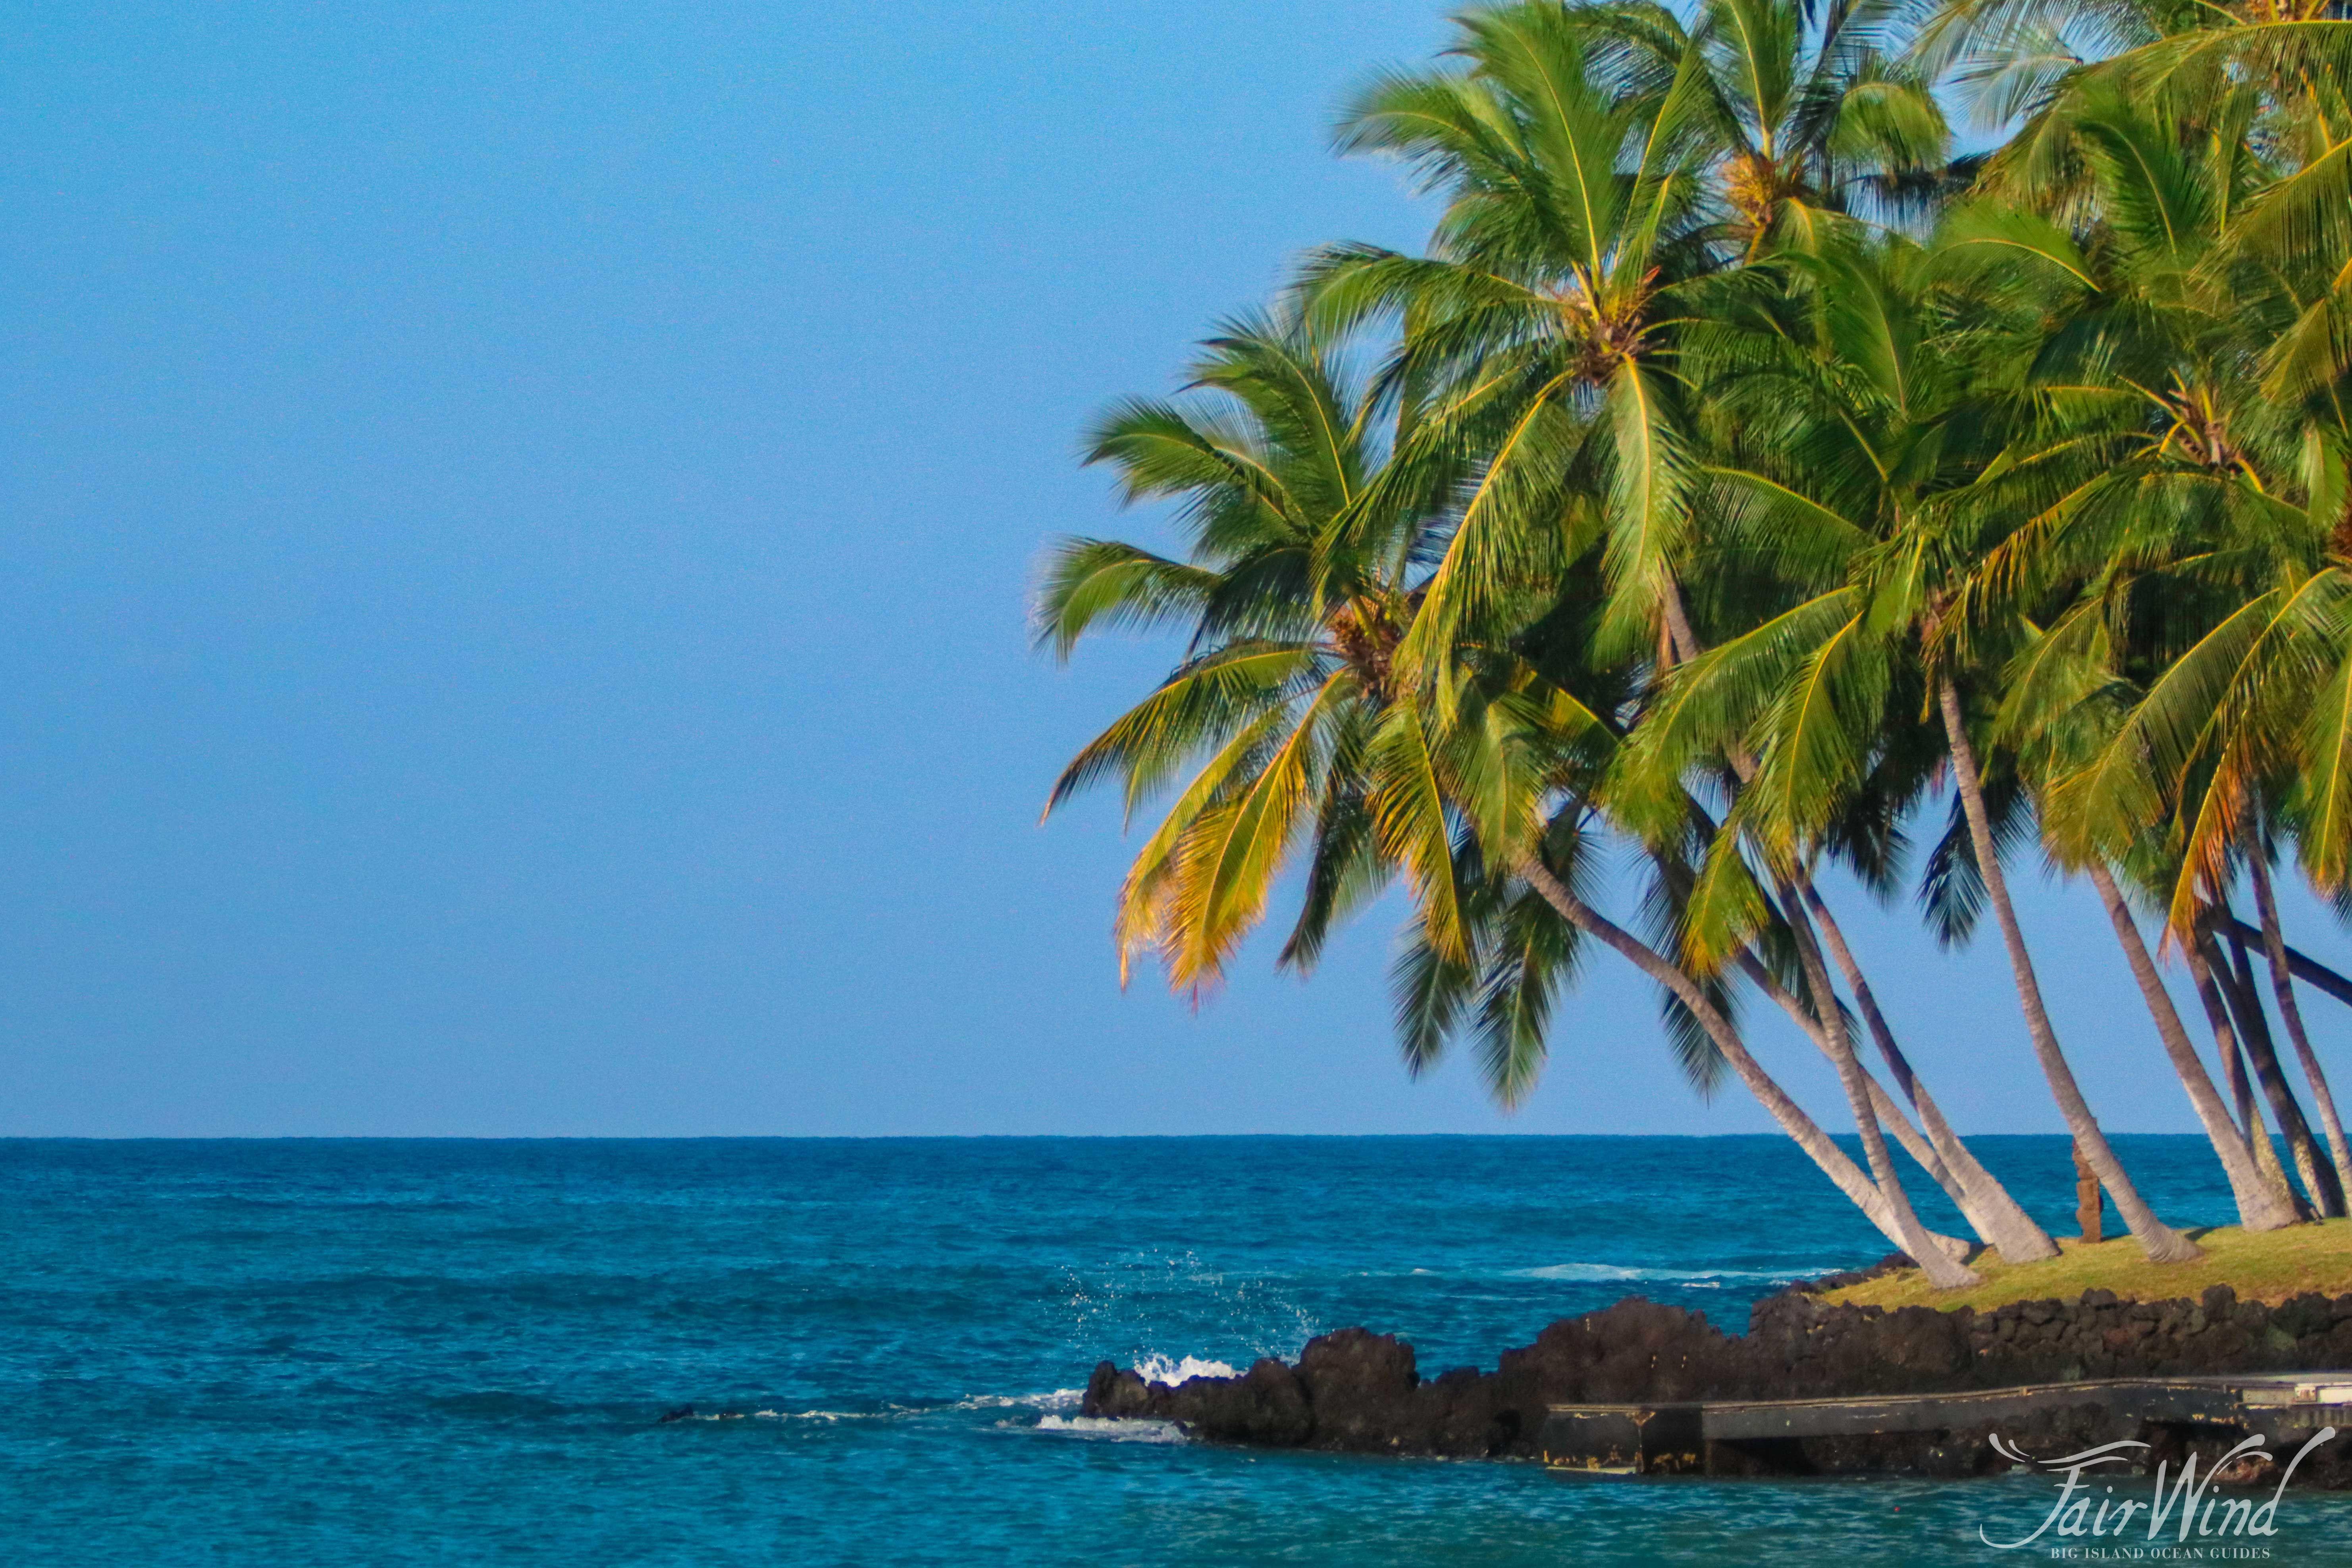 Snorkel Kona - Kealakekua Bay Hawaii - Fair Wind Cruises